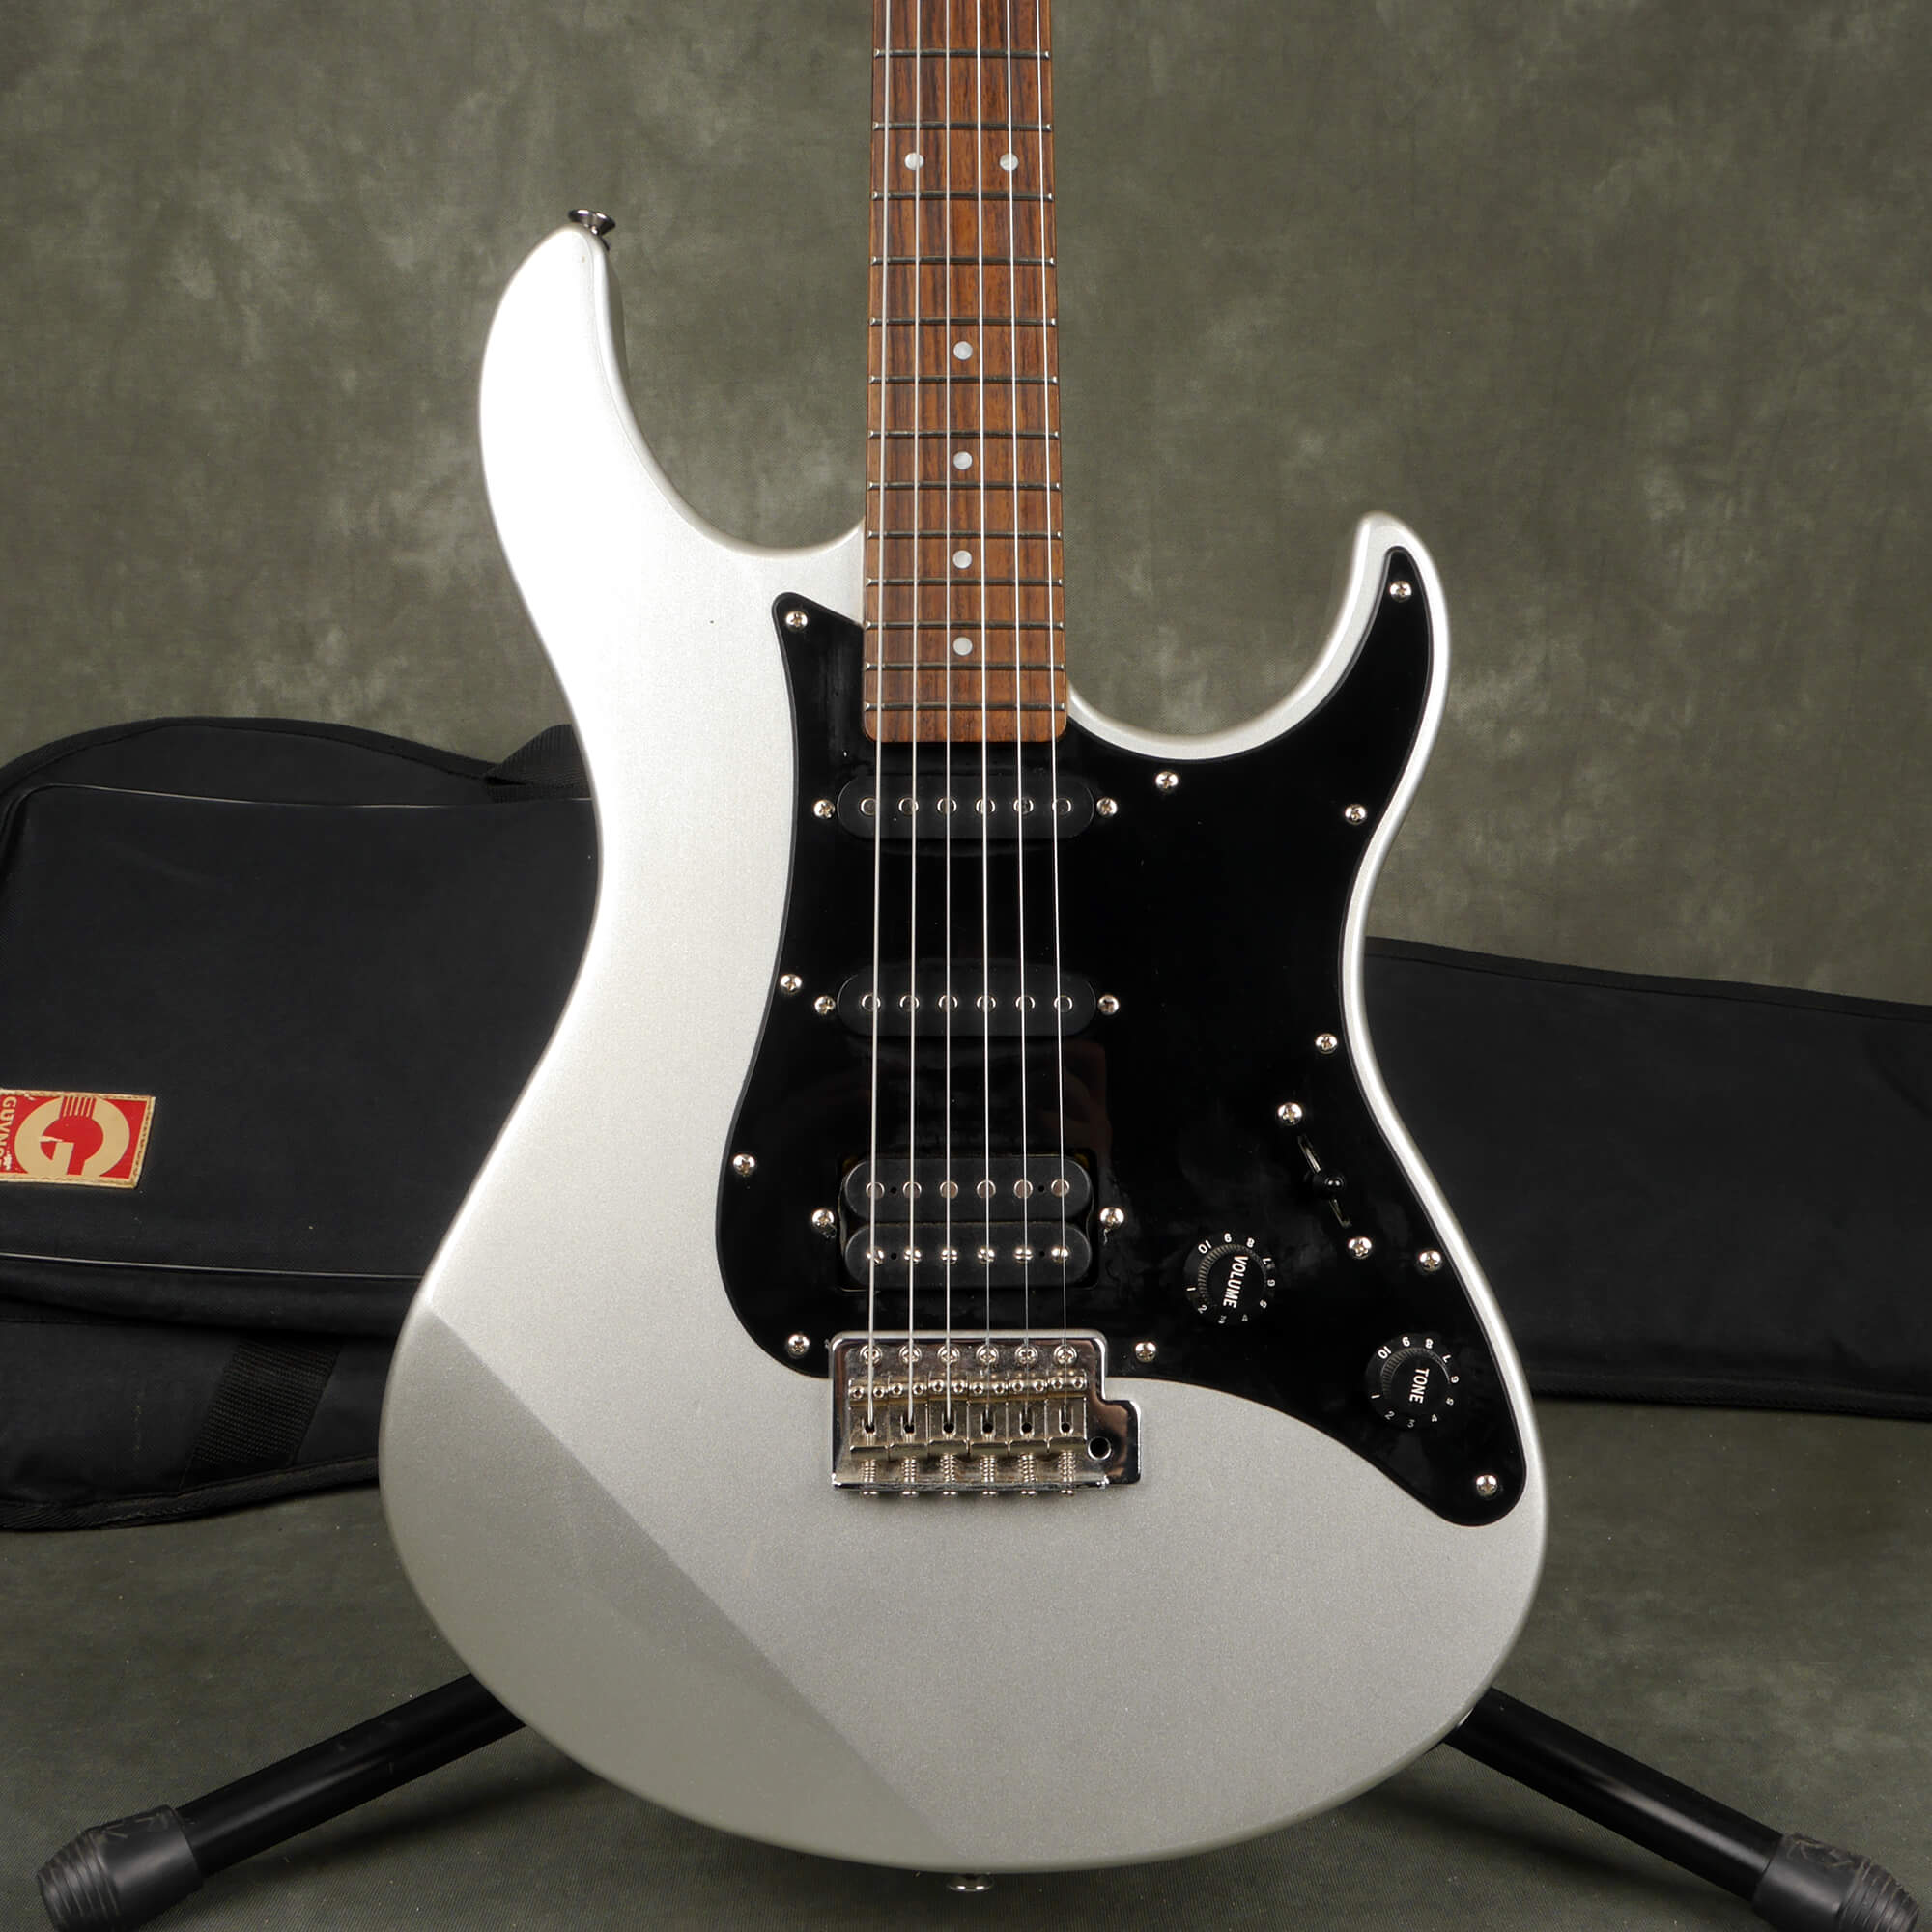 Yamaha Pacifica 112X Electric Guitar - Silver w/Gig Bag - 2nd Hand